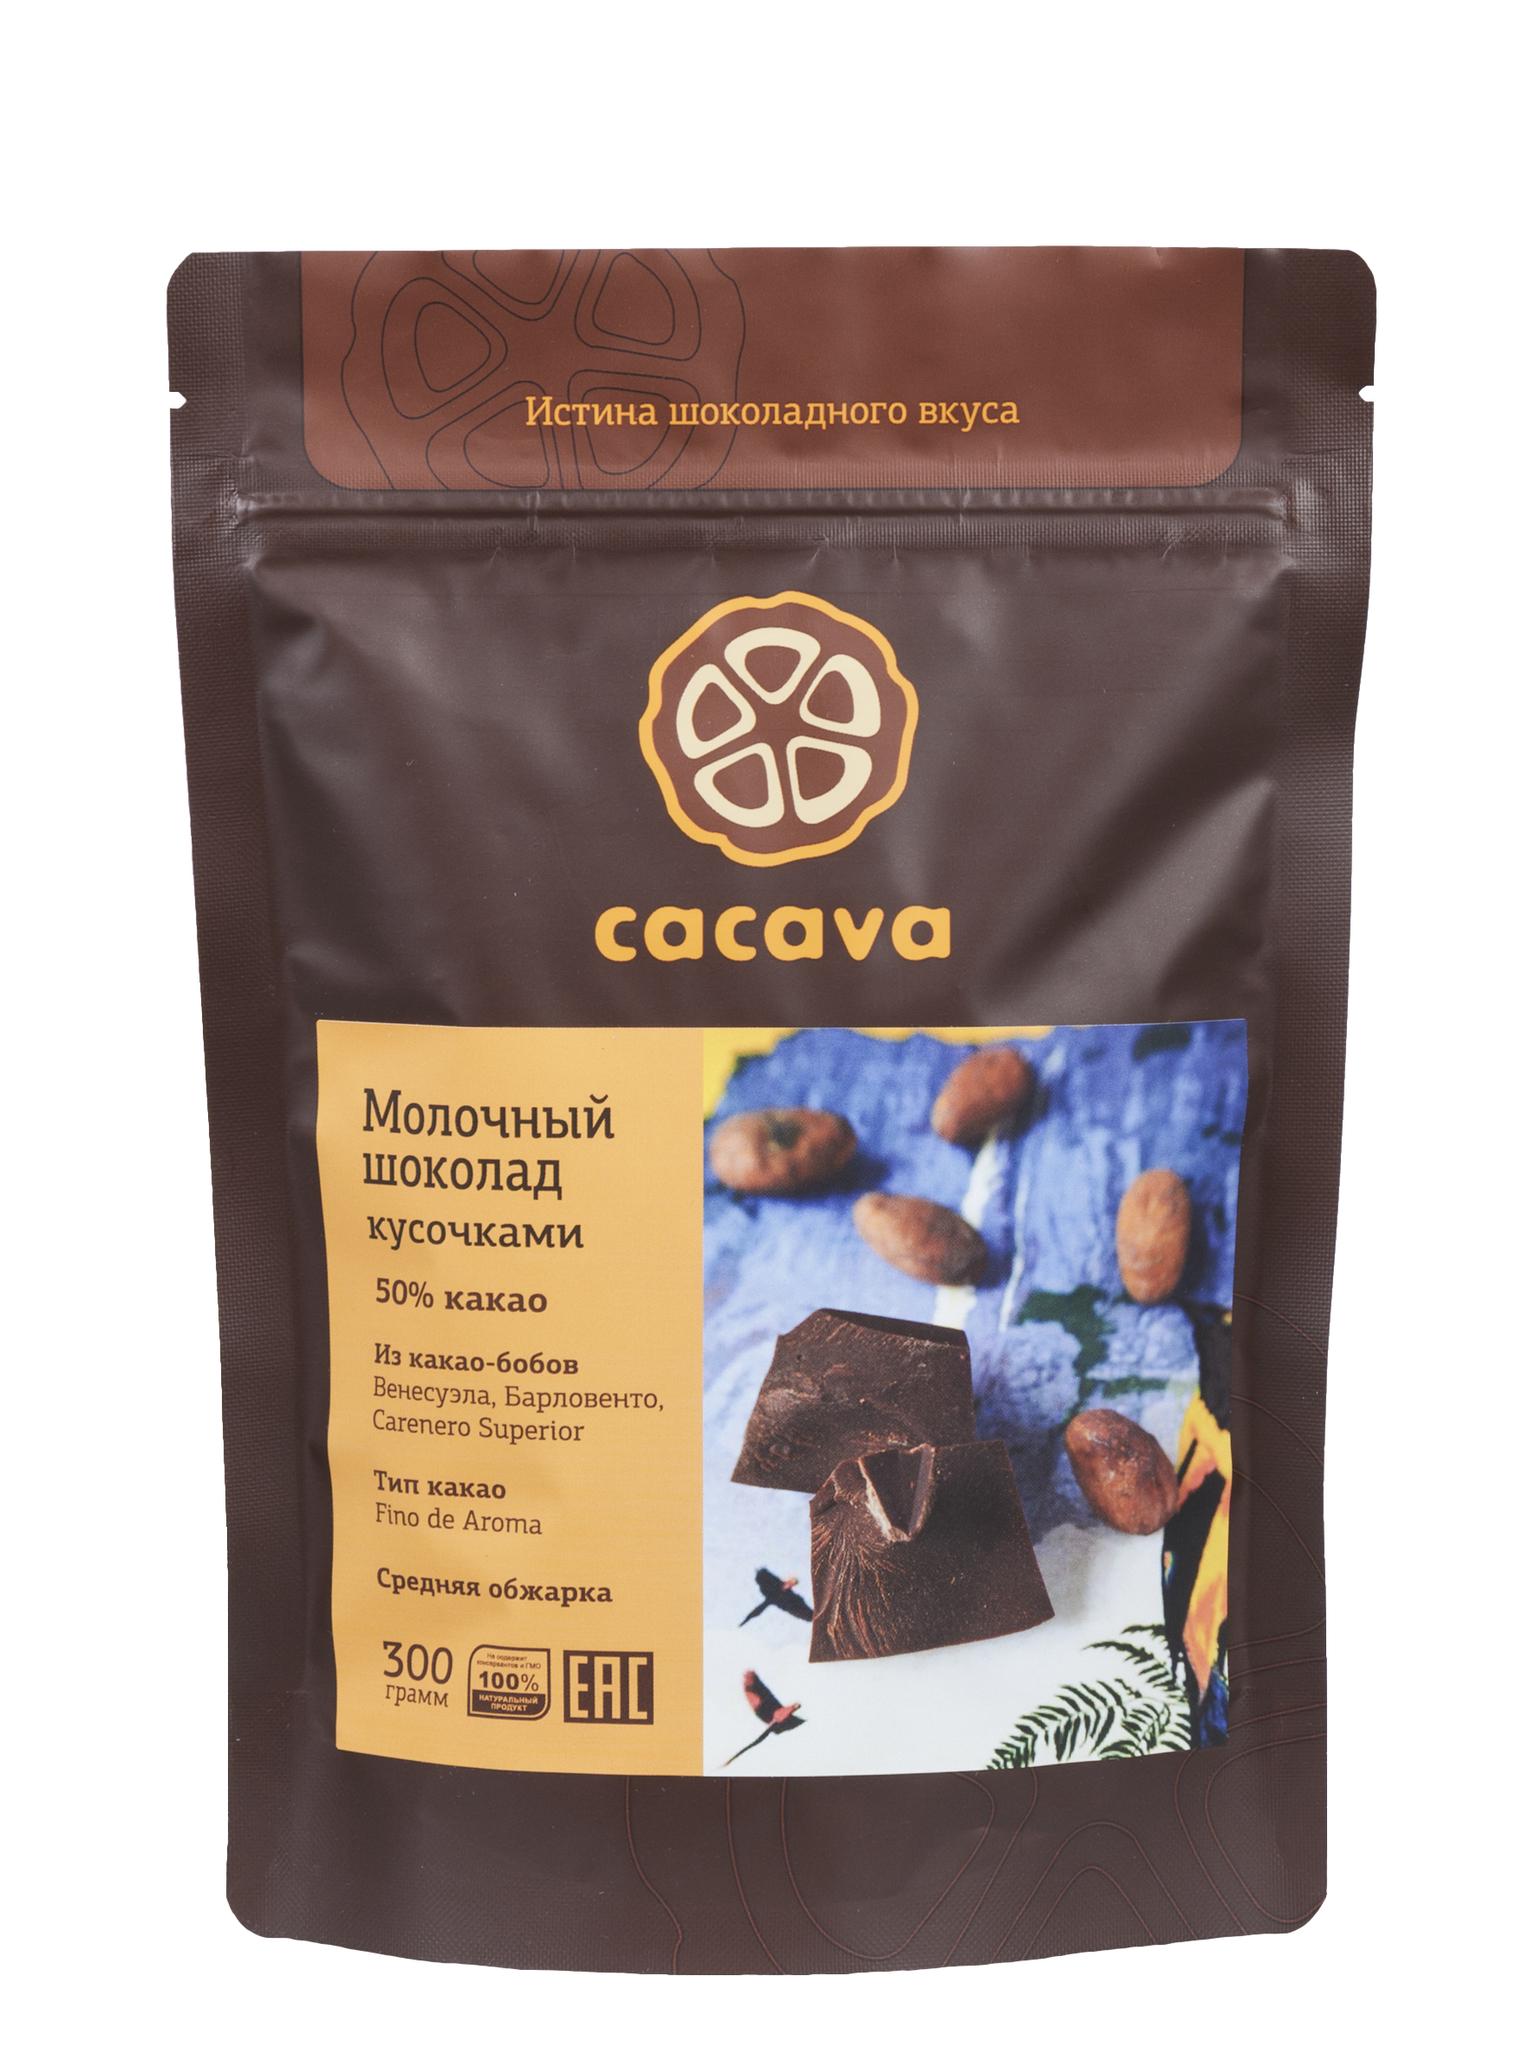 Молочный шоколад 50 % какао (Венесуэла), упаковка 300 грамм